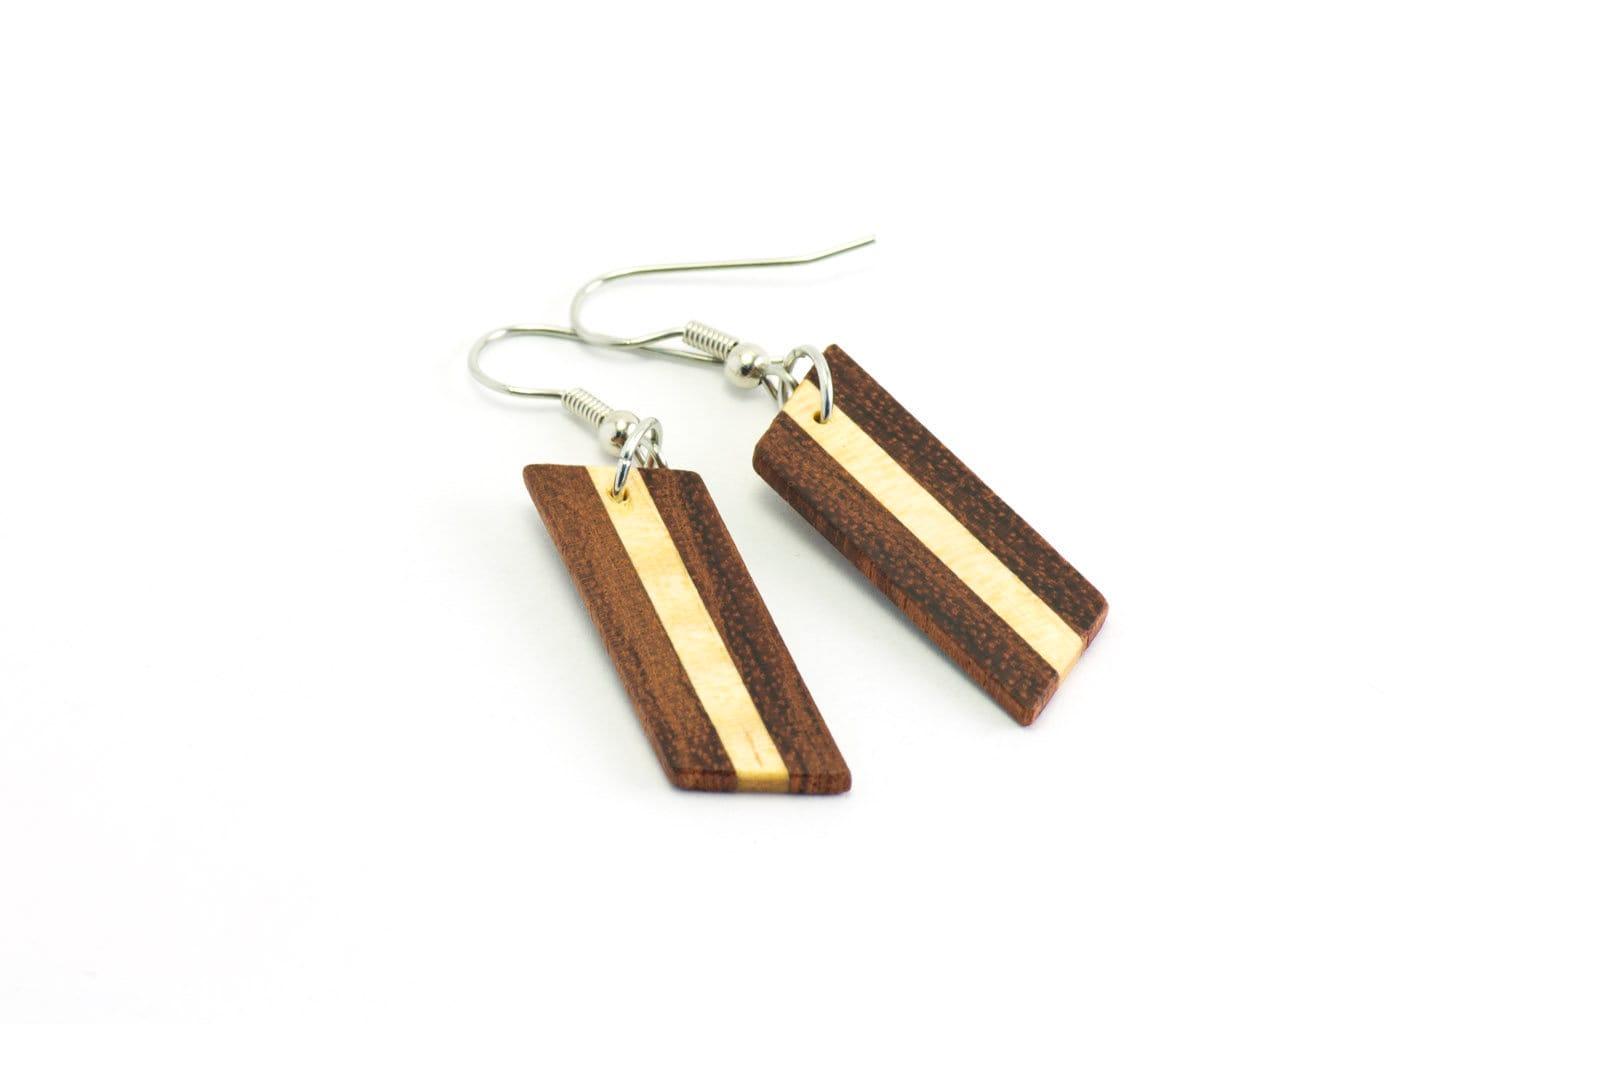 Wood Pendant Earrings - Wooden Earrings - Bubinga and Maple - Dangle  Earrings - Stainless Steel - Minimalist Earrings